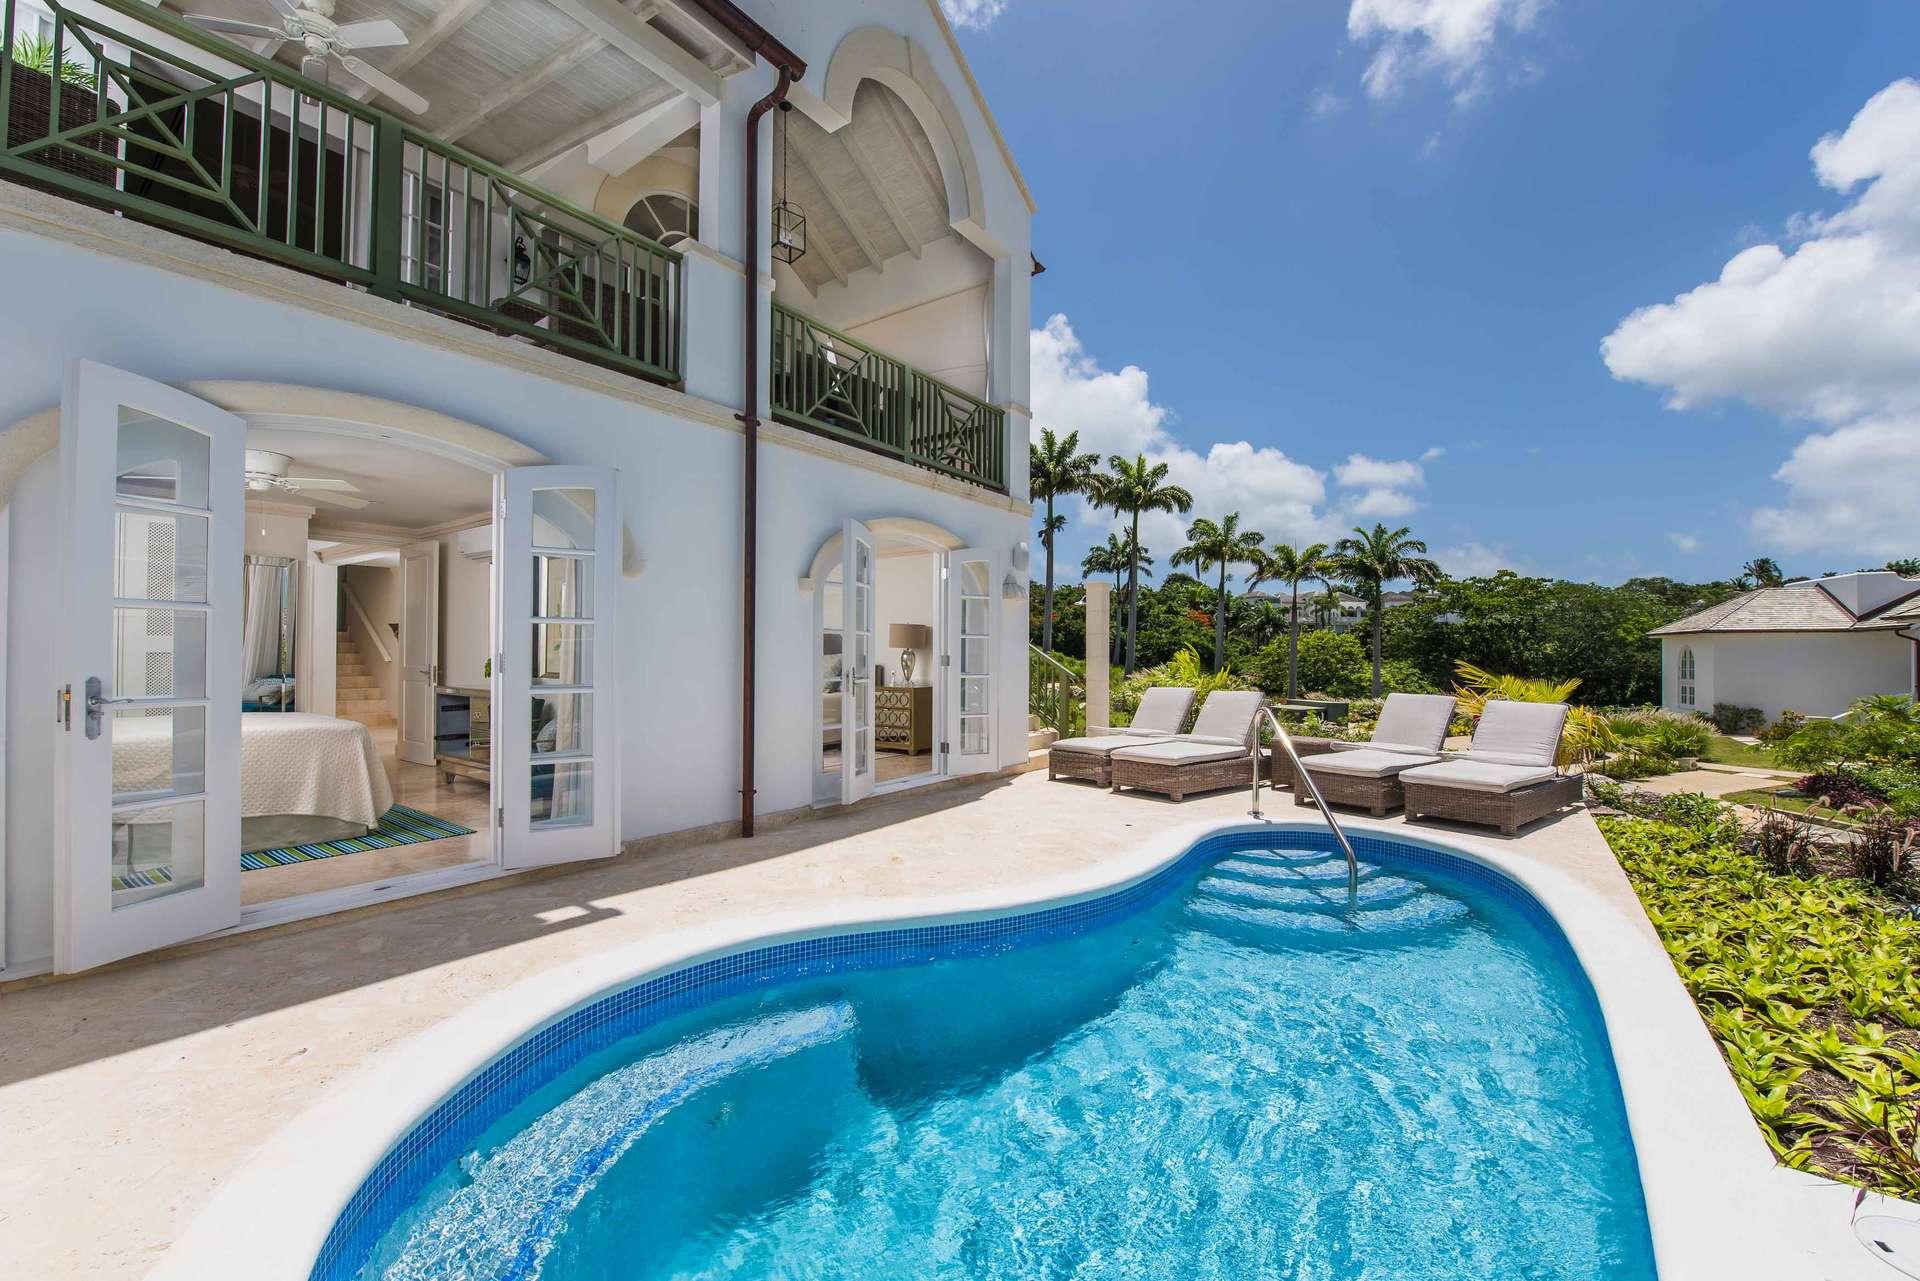 Luxury villa rentals caribbean - Barbados - St james - Royal westmoreland golf resort - Sugar Cane Ridge 9 - Image 1/9